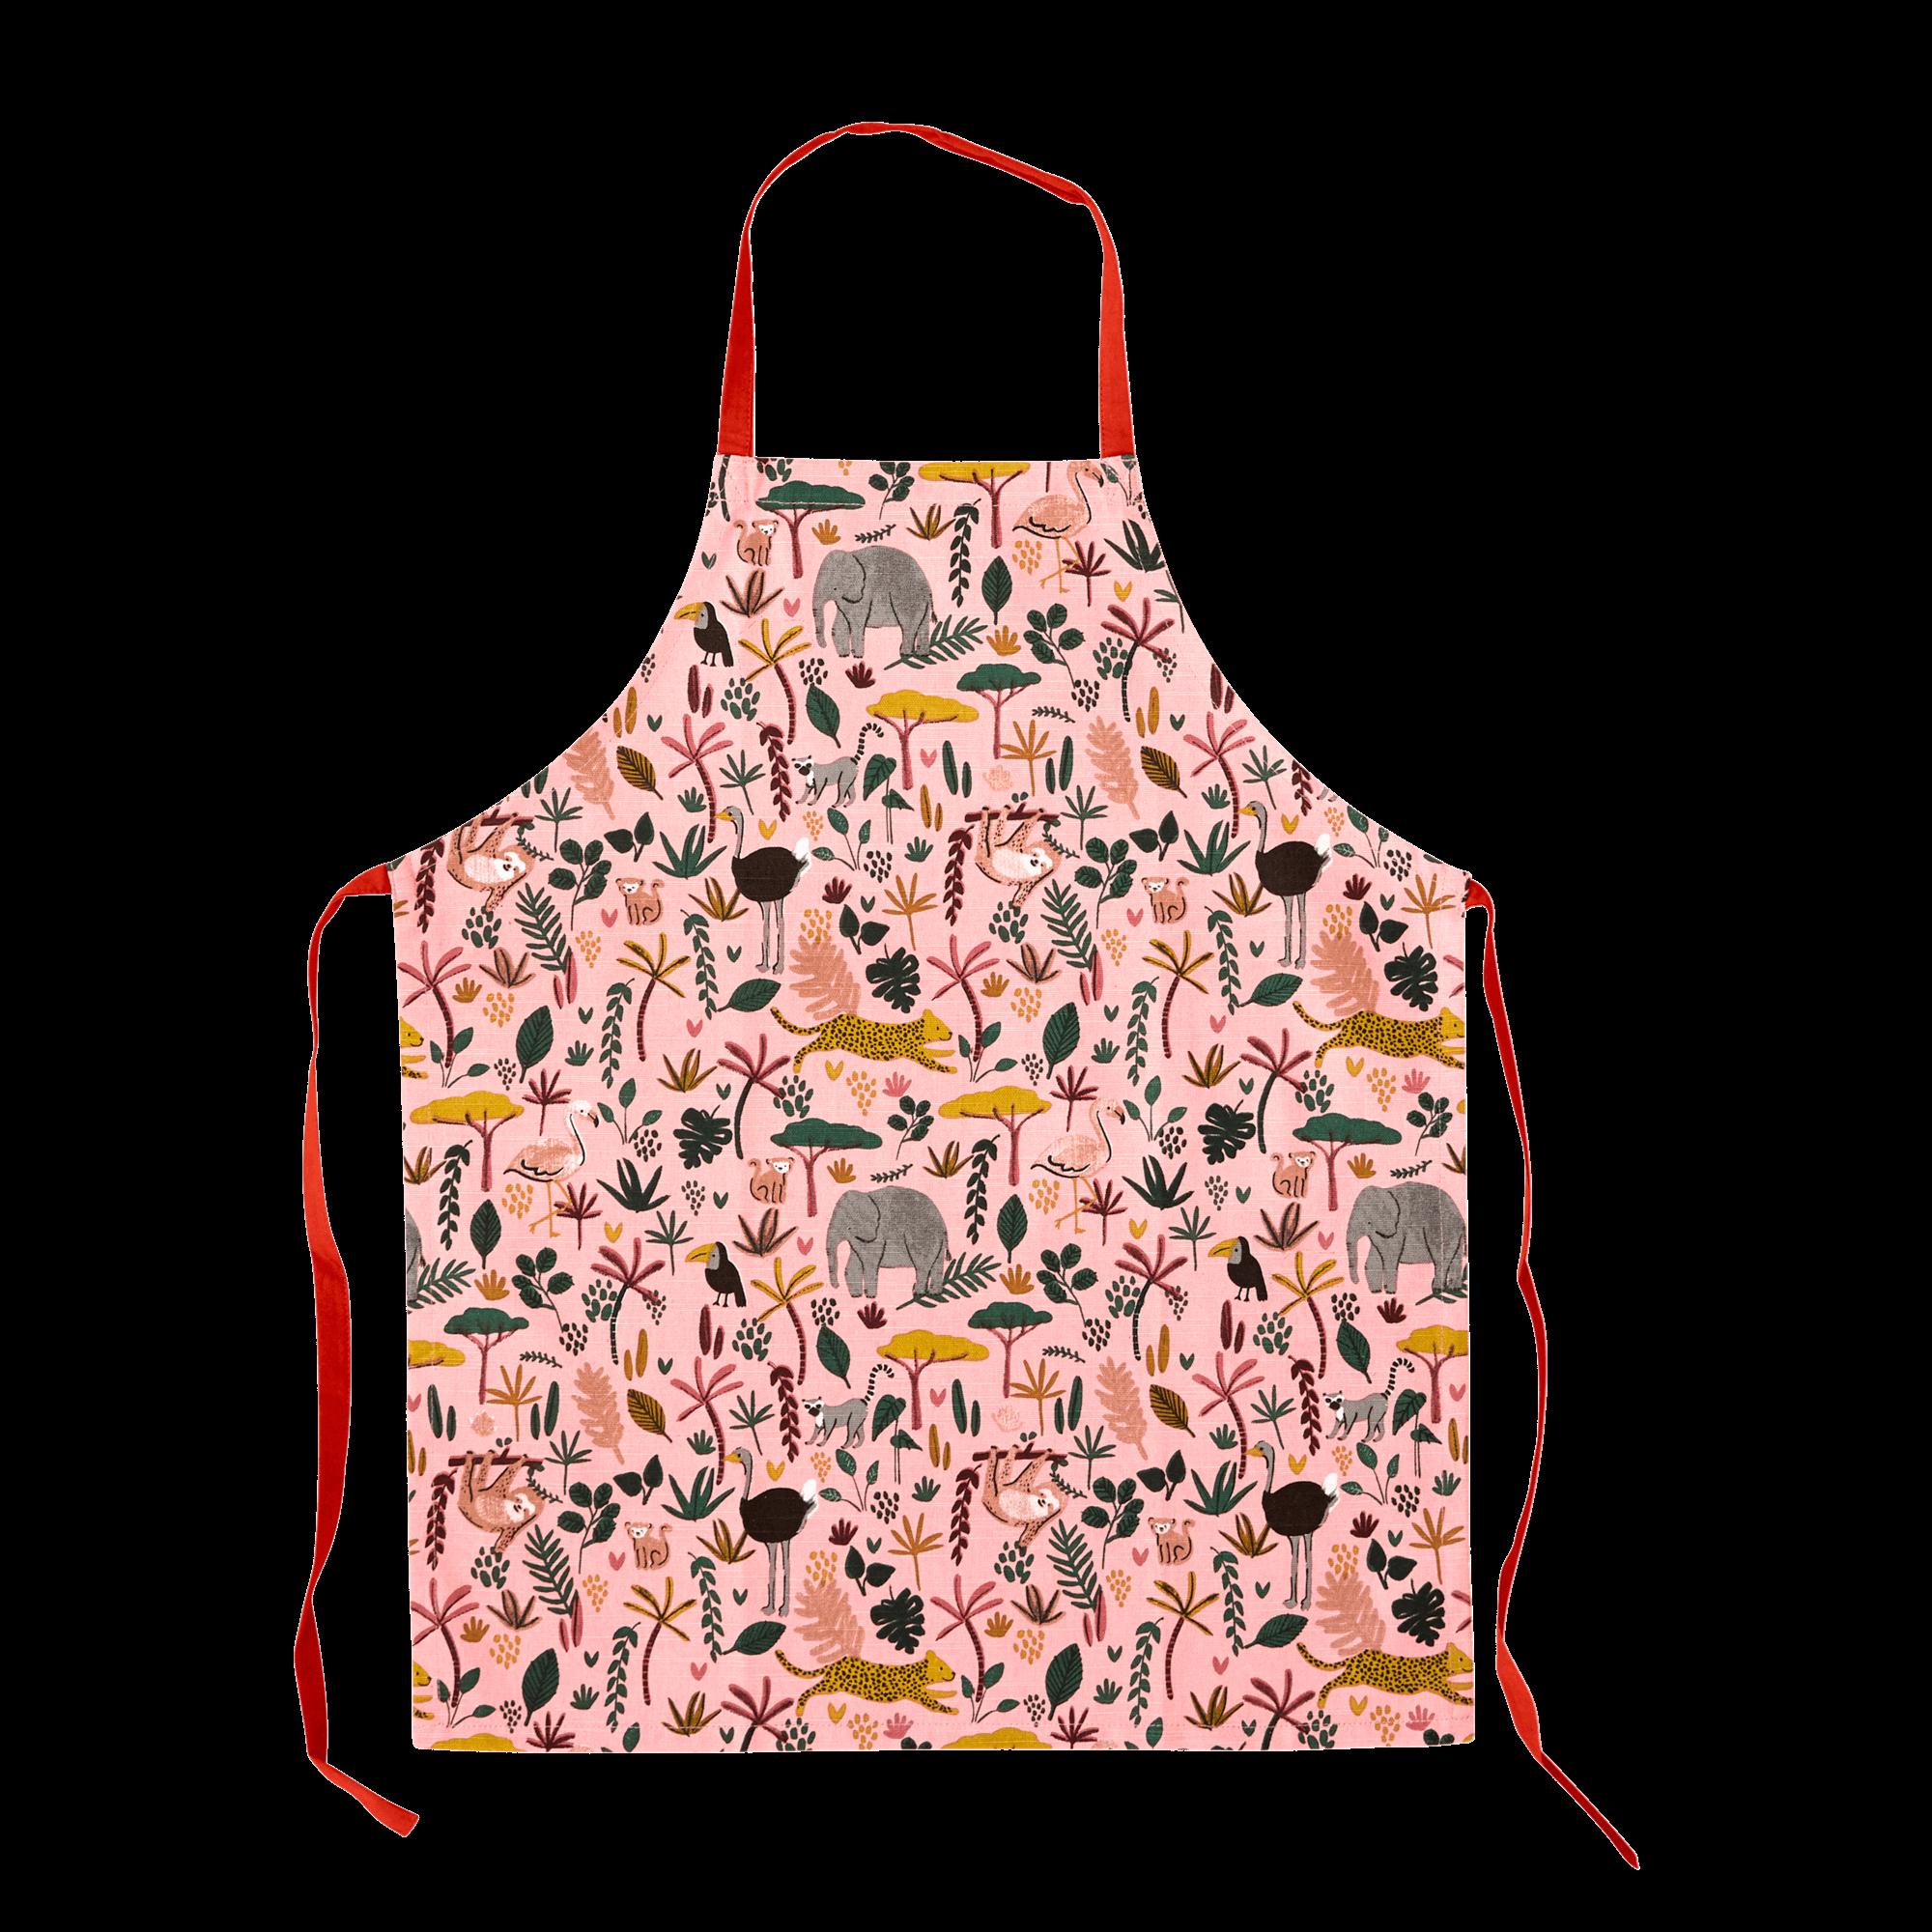 Rice - Kids Cotton Apron w. All Over Jungle Animals Print - Coral